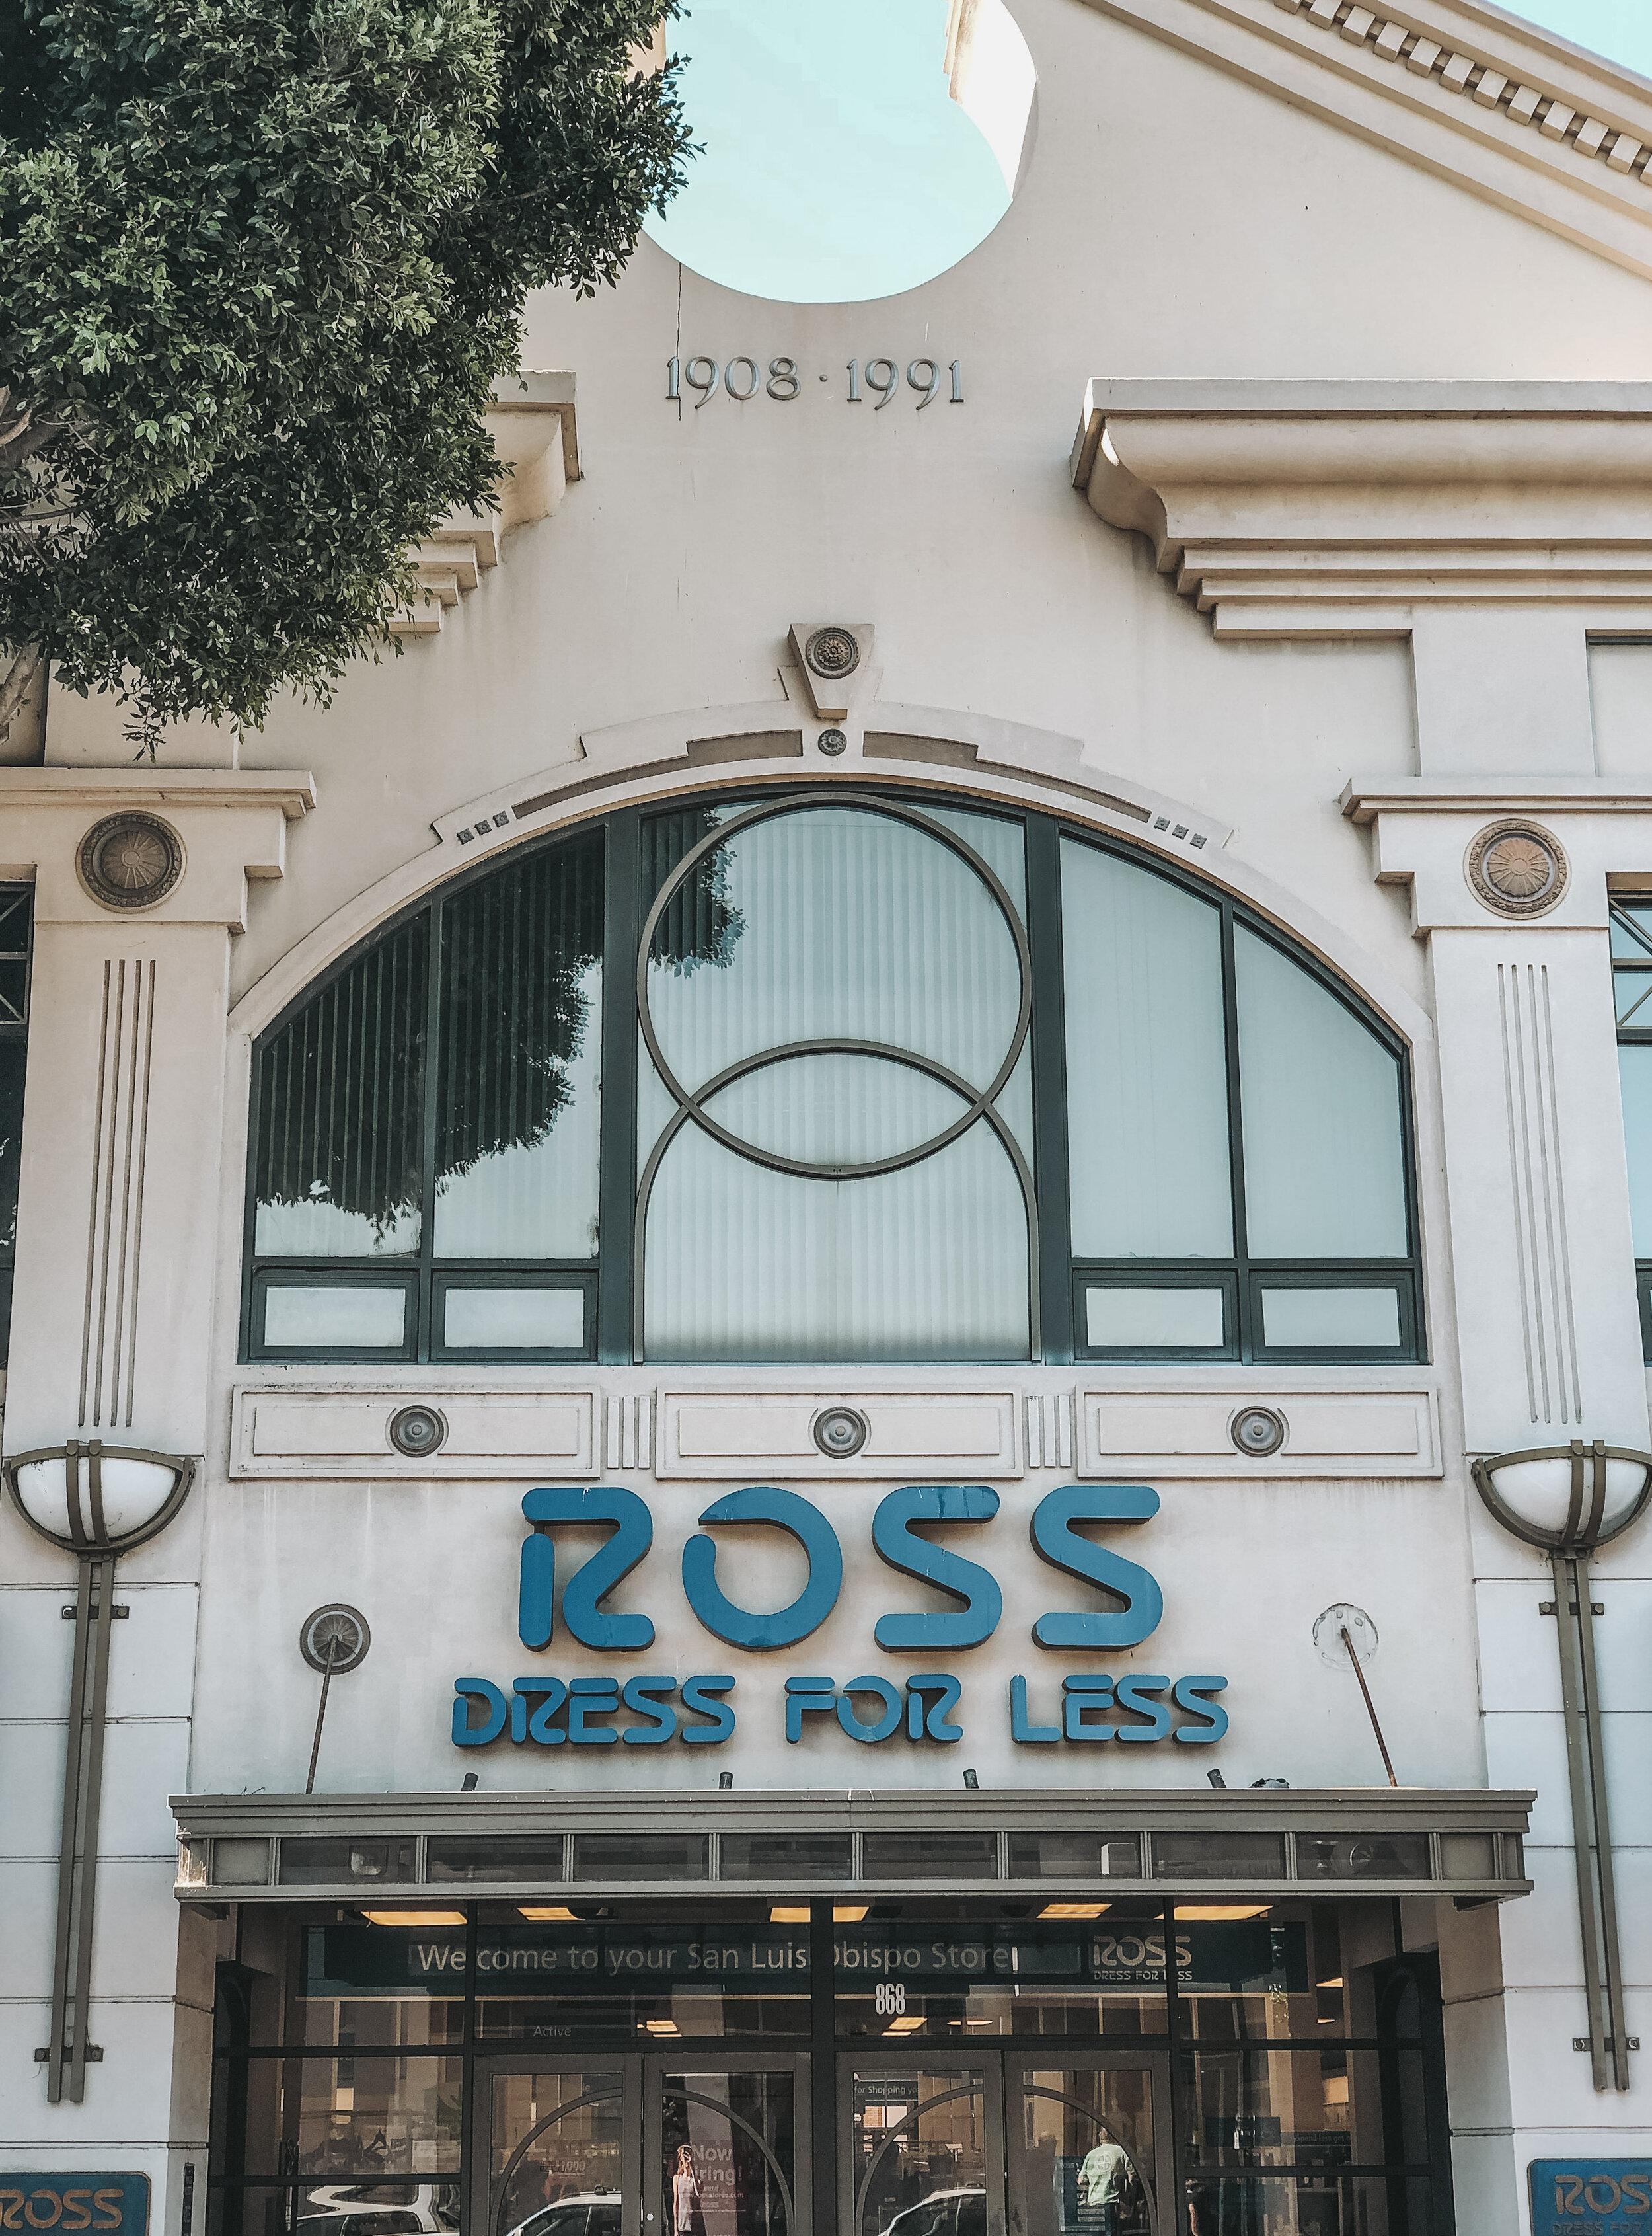 Ross Dress For Less, San Luis Obispo, California | Cedar + Surf